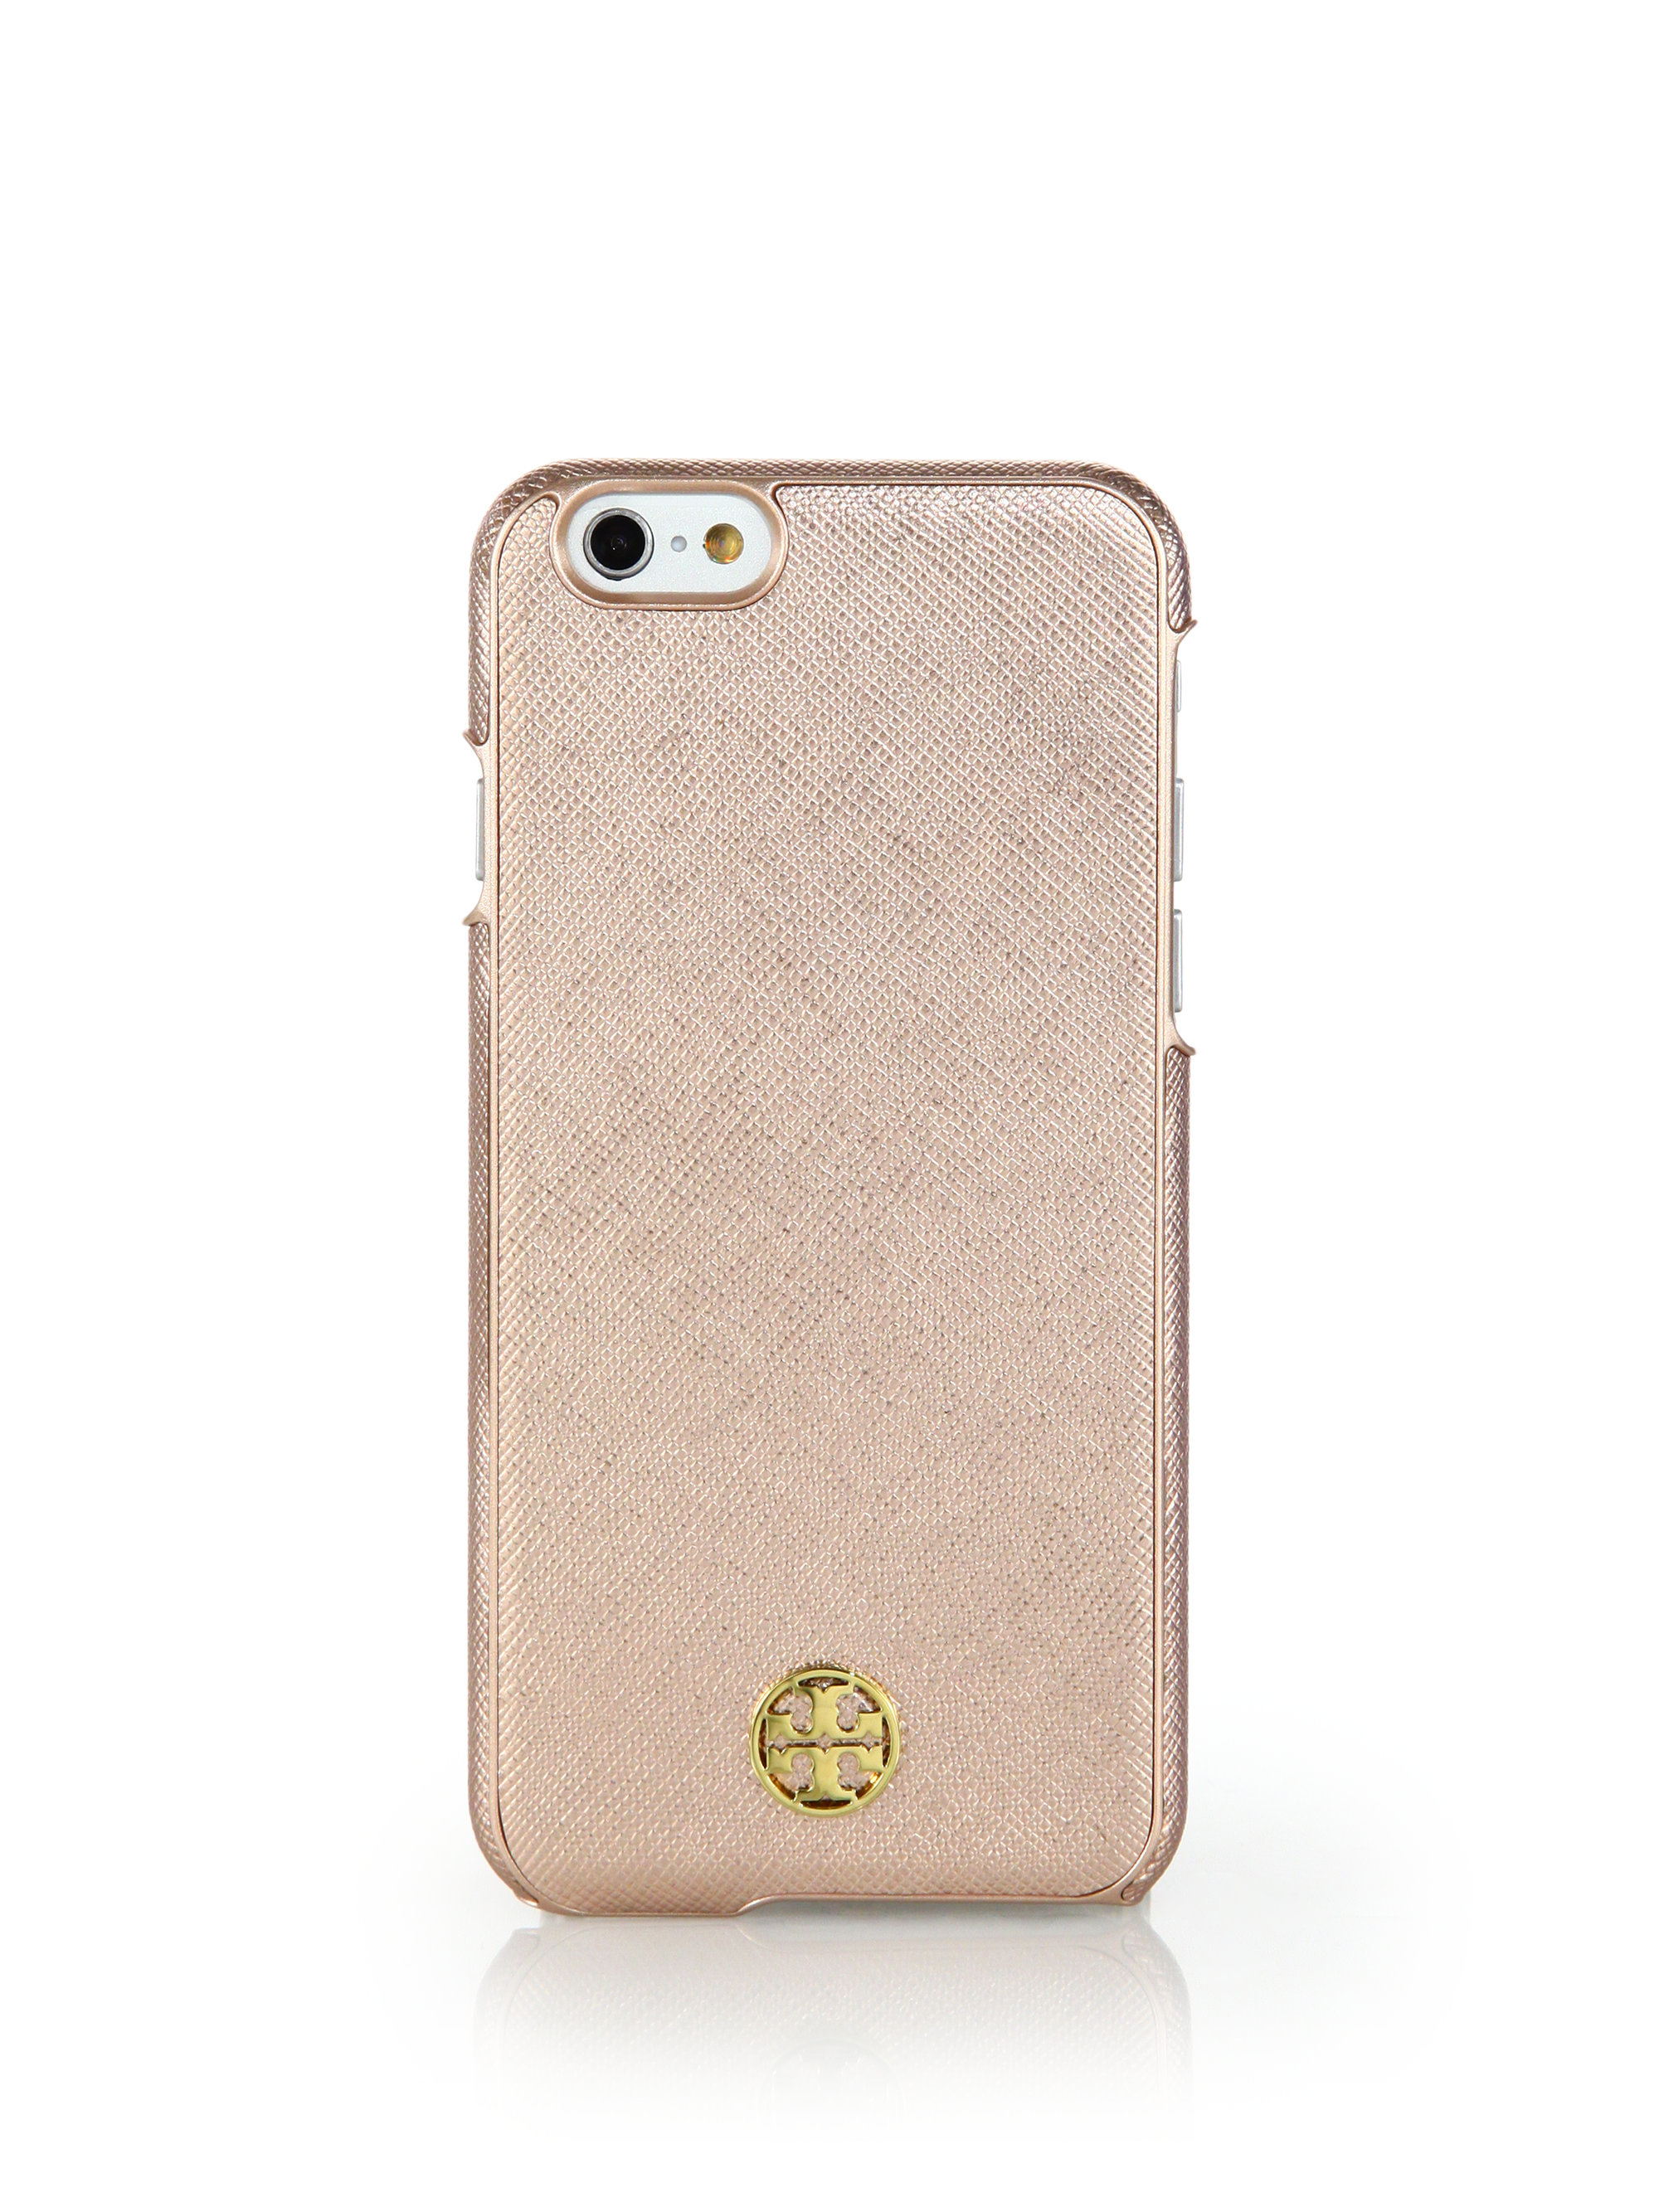 new concept f289a 09046 Tory Burch Robinson Metallic Saffiano Leather Iphone Case